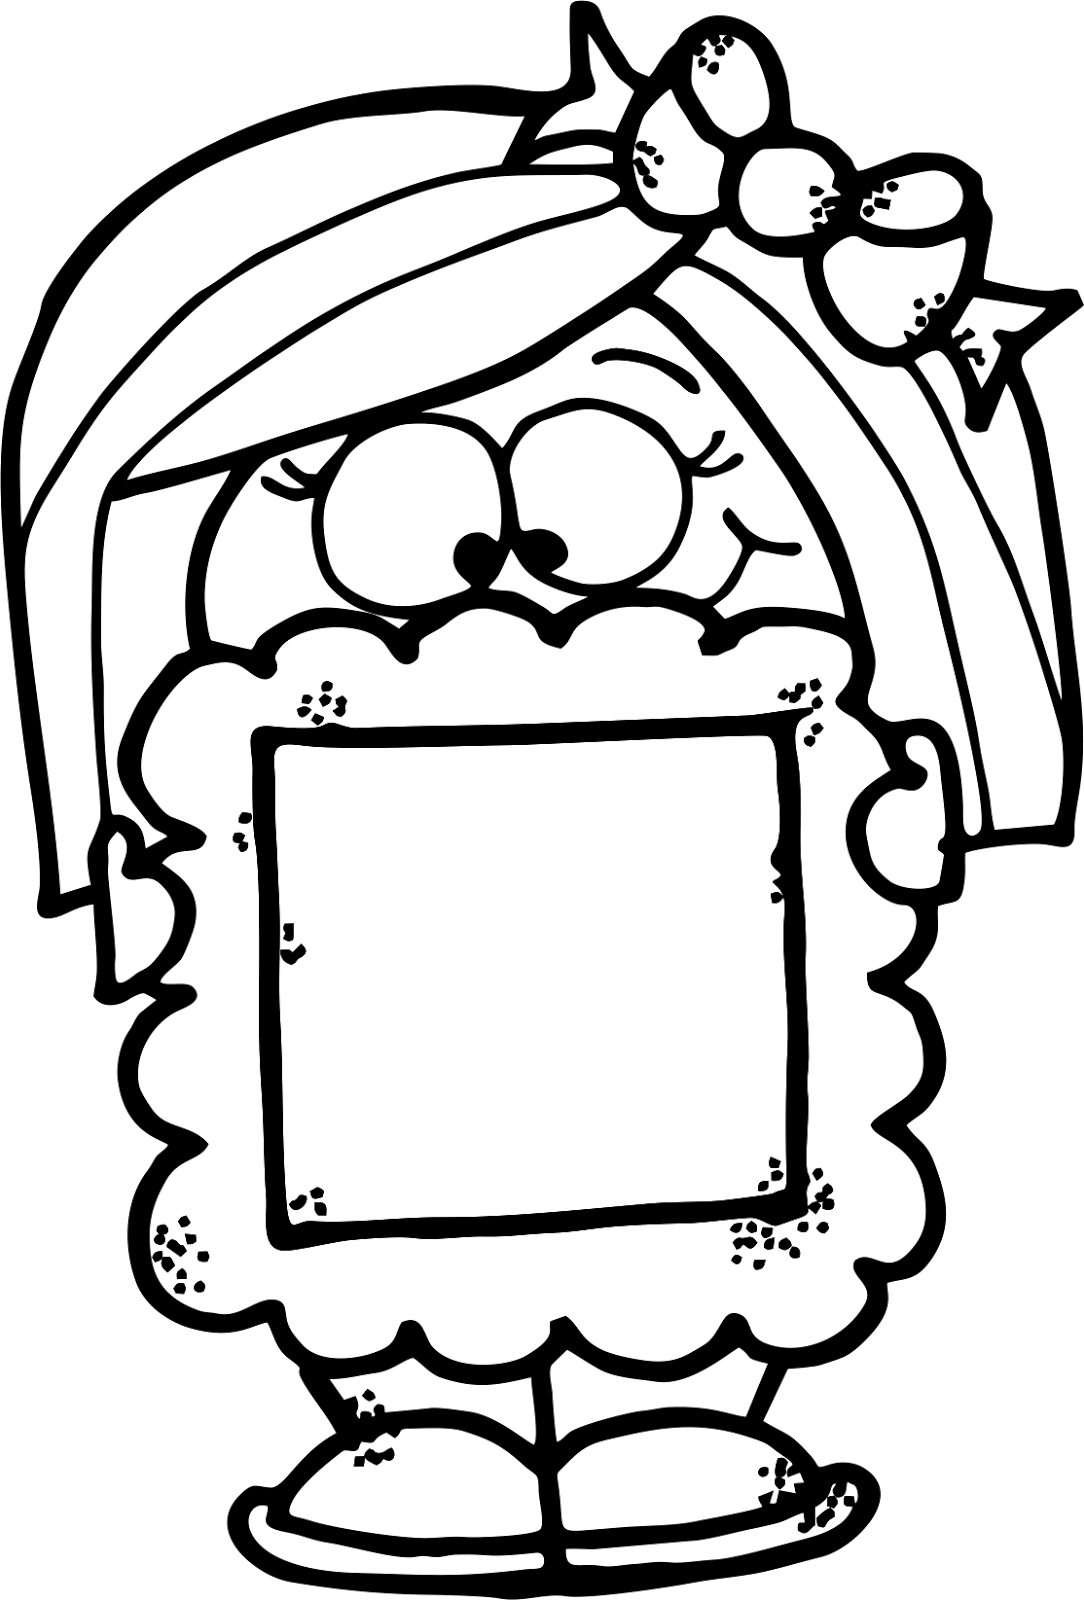 Family picture framed clipart black and white svg transparent download WorksheetJunkie: Free -ut word family clipart and frame kiddos ... svg transparent download